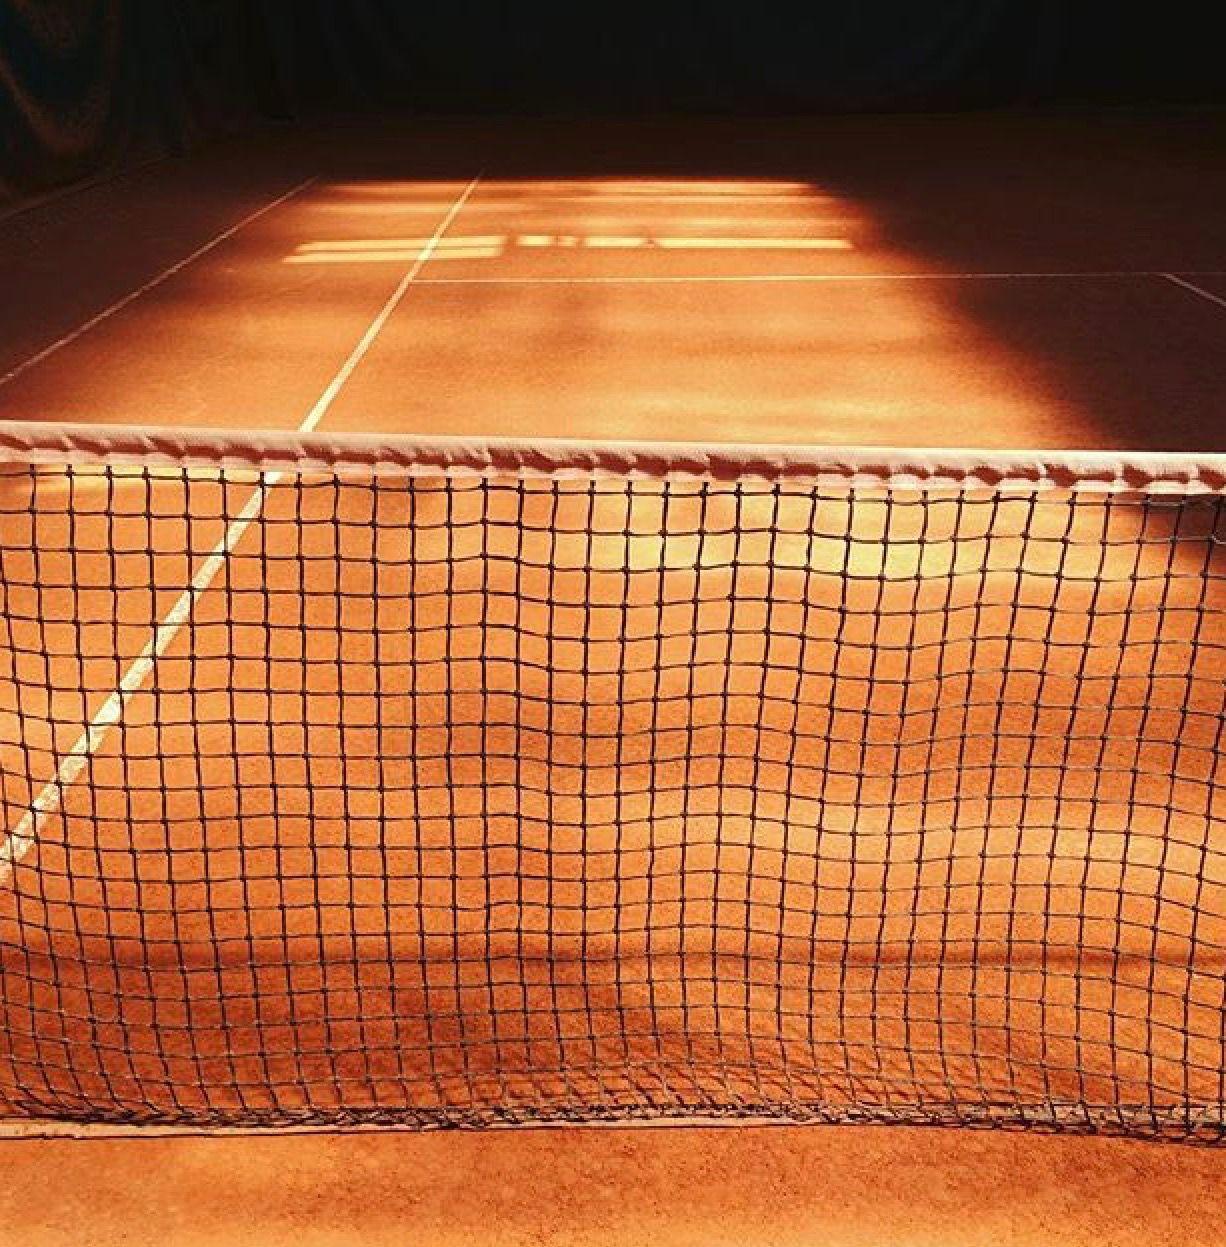 Clay Court Picture By Anne Deniau Orange Aesthetic Tennis Tennis Court